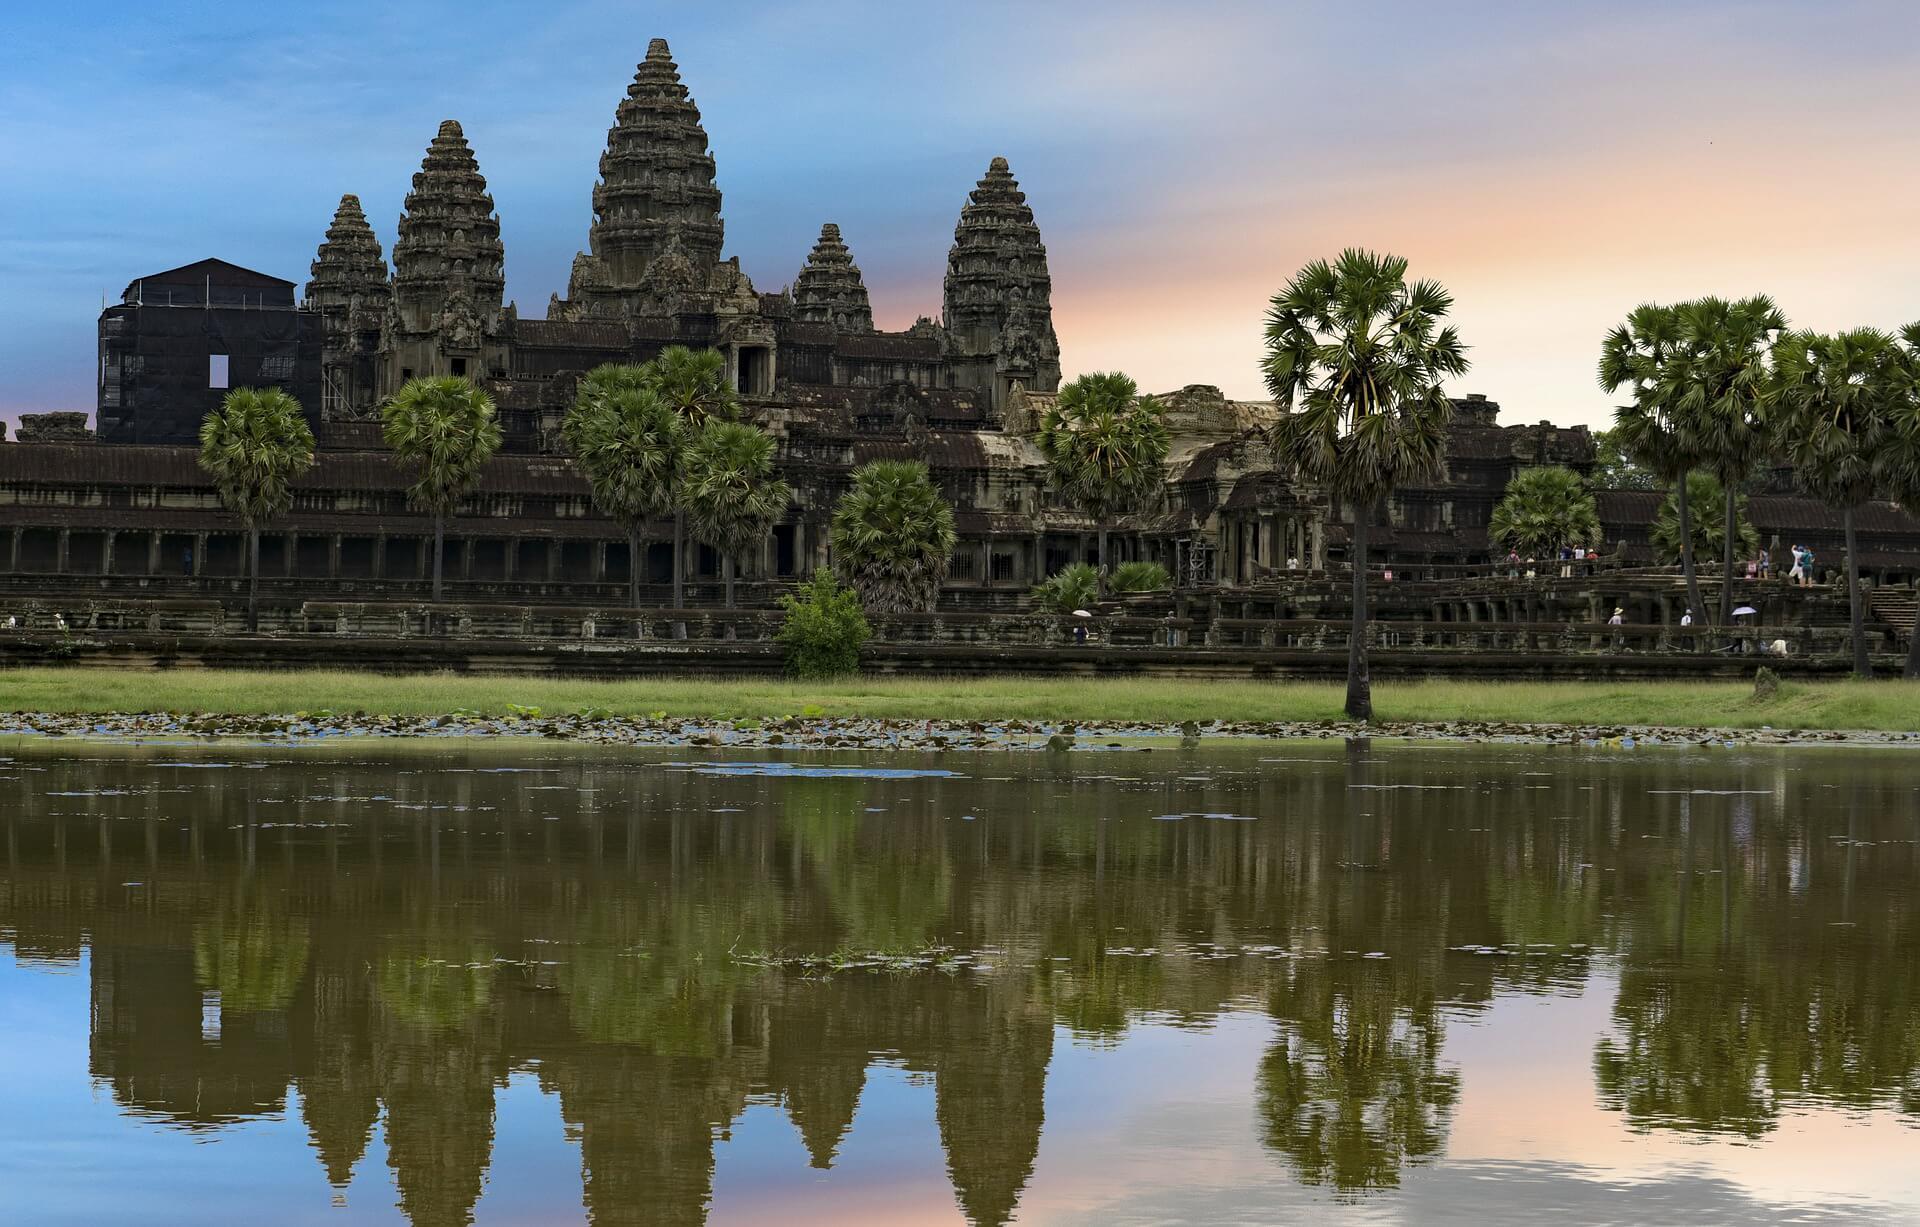 Phenom Penh to Siem Reap flight